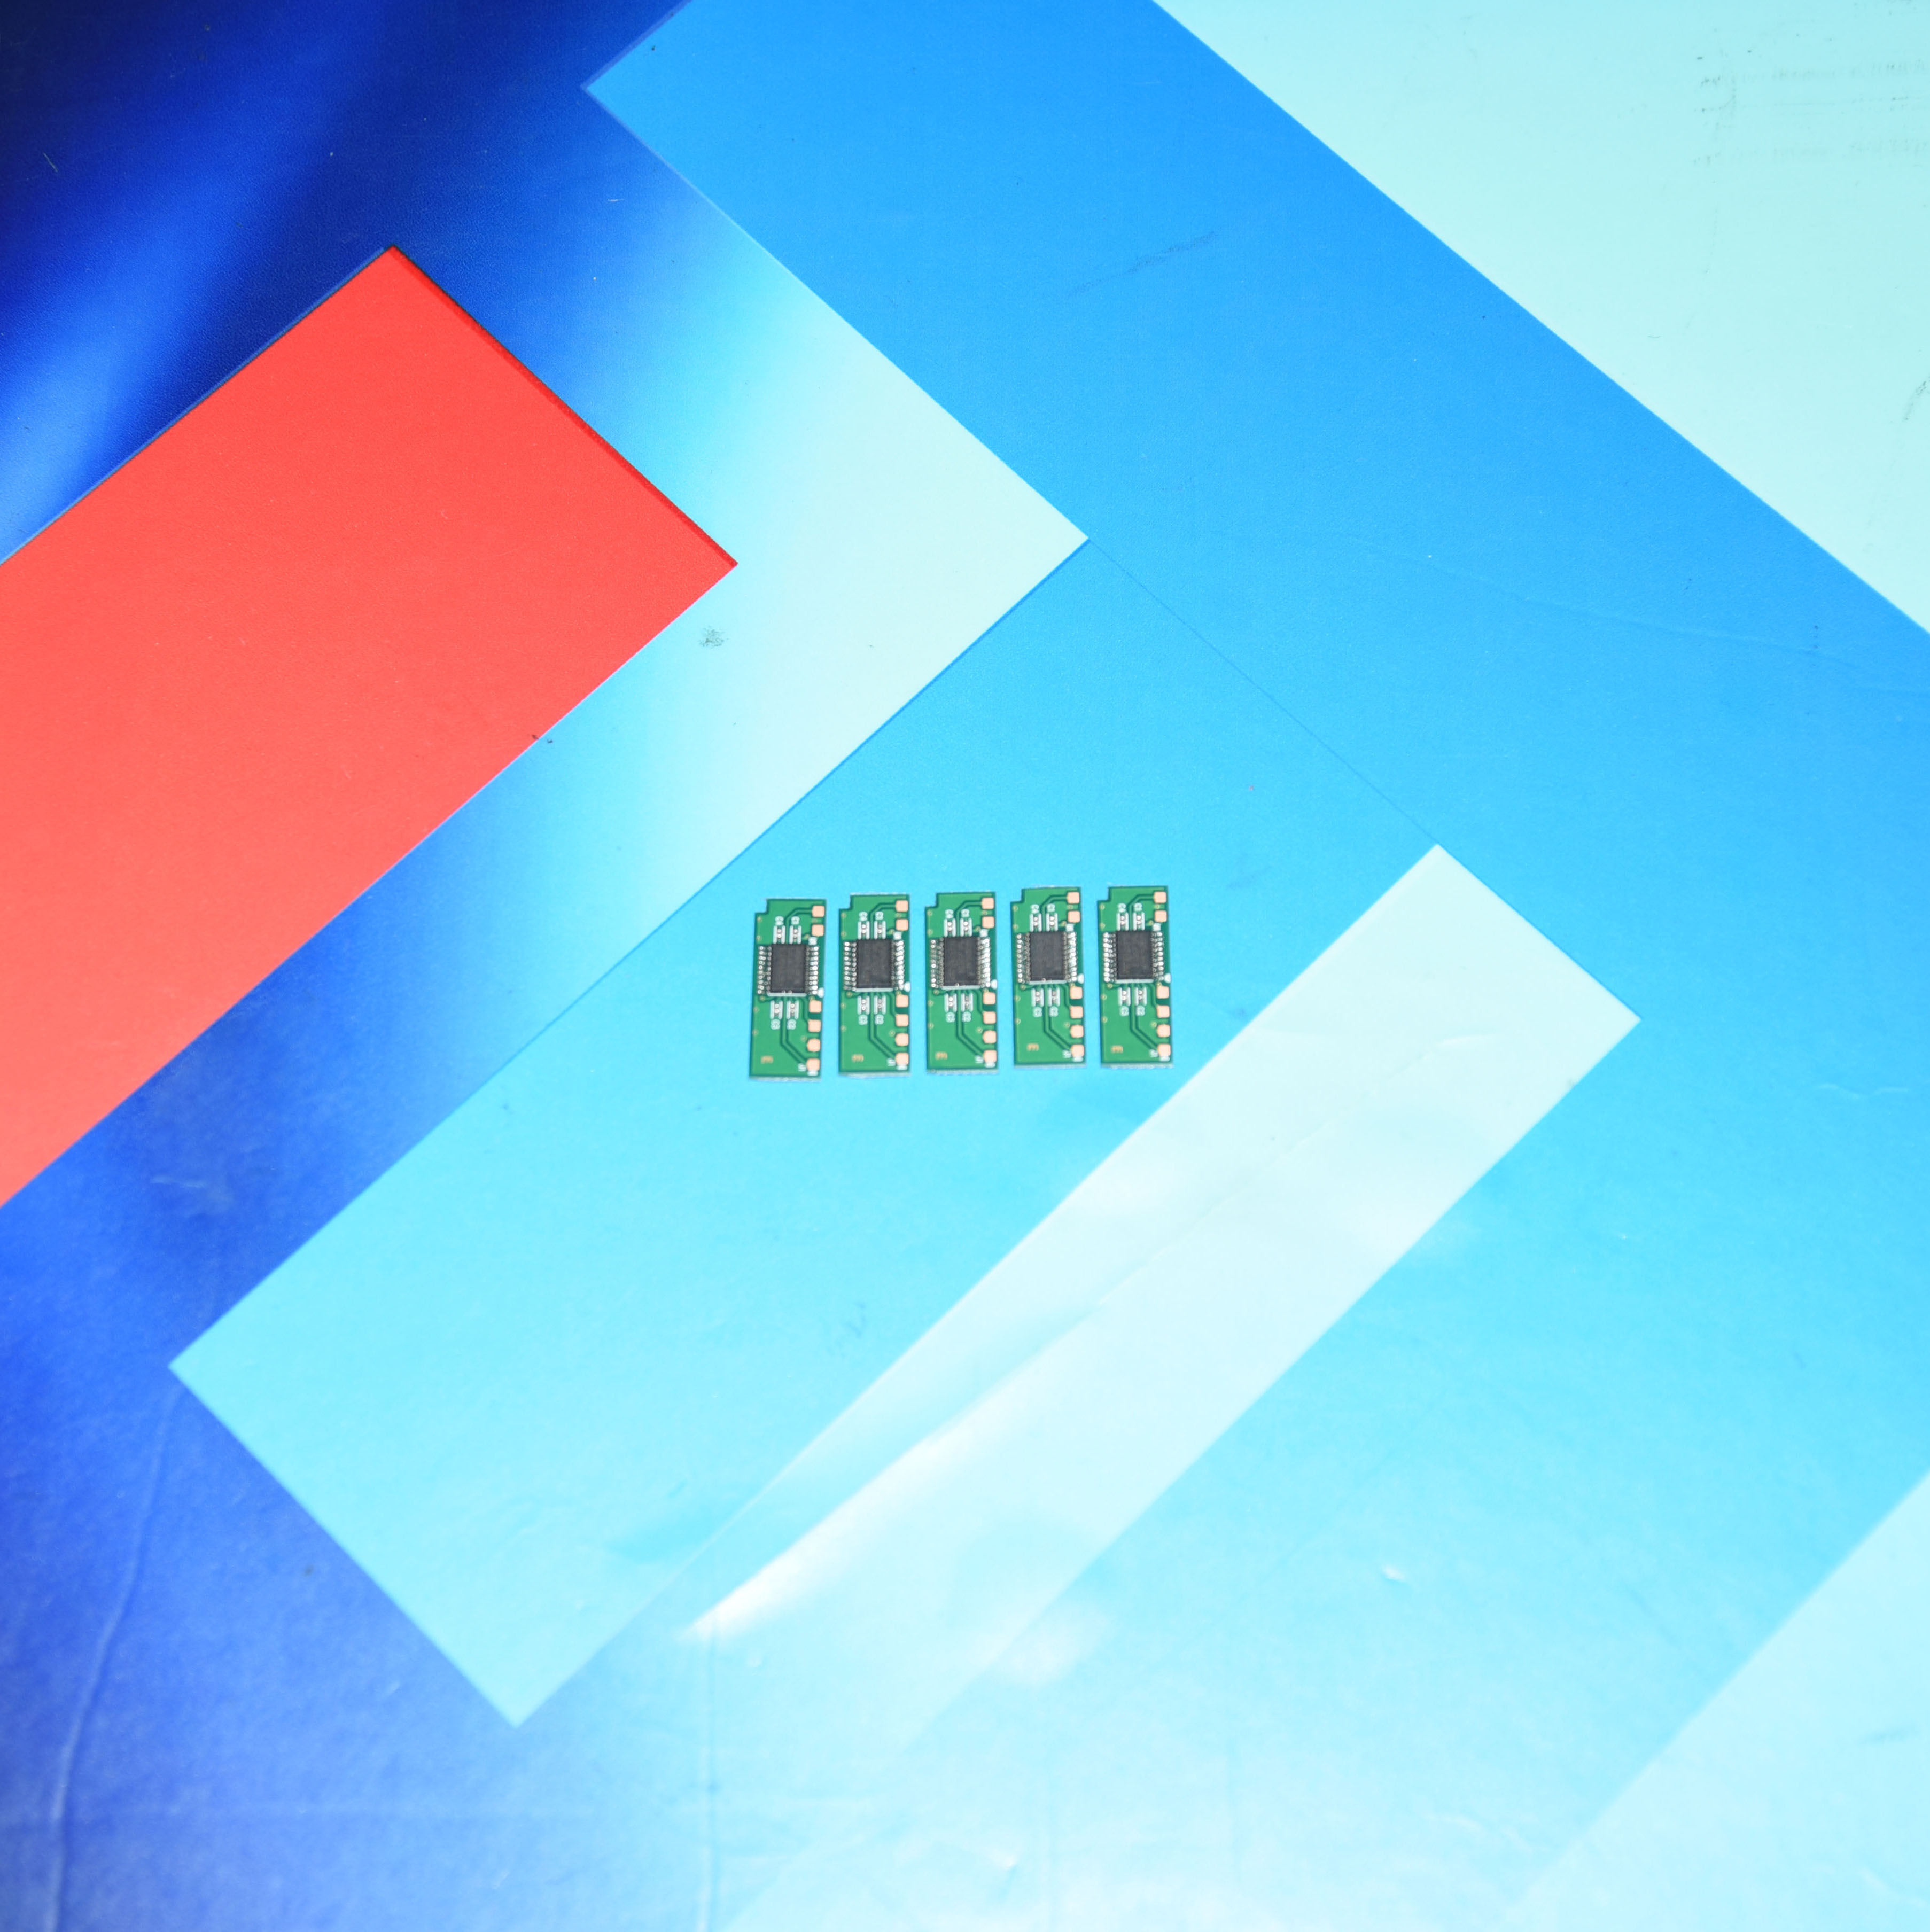 new  toner chip for Pantum P2500W P2505 M6200 M6500 M6505 M6600 M6607 PC-210 PC-211E PC-210E PC-211  toner chip